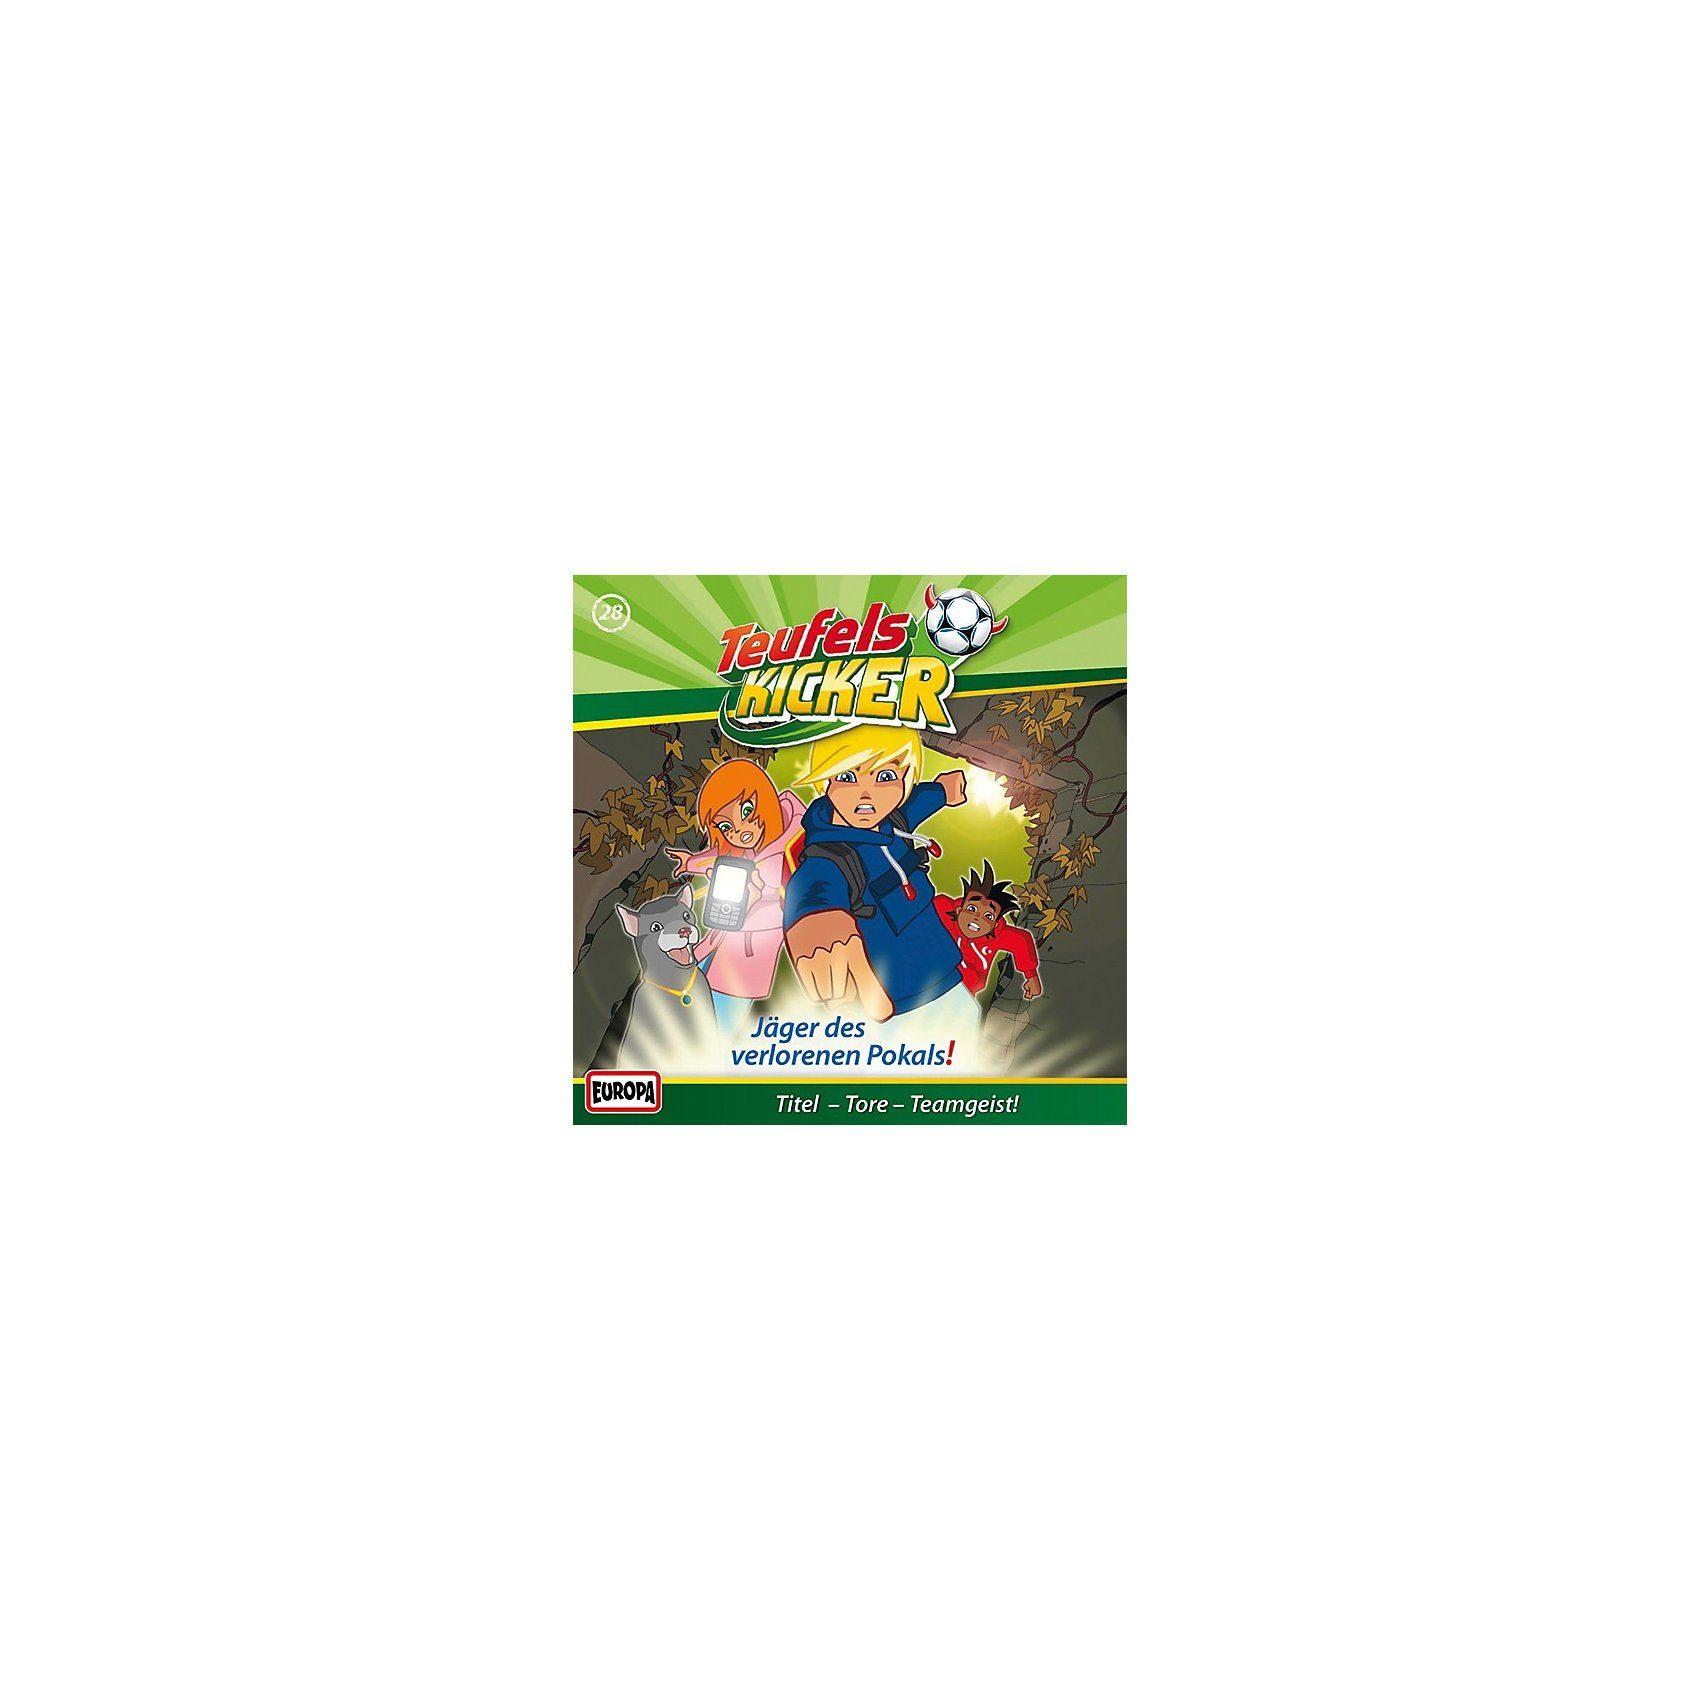 Sony CD Teufelskicker 28 - Jäger des verlorenen Pokals